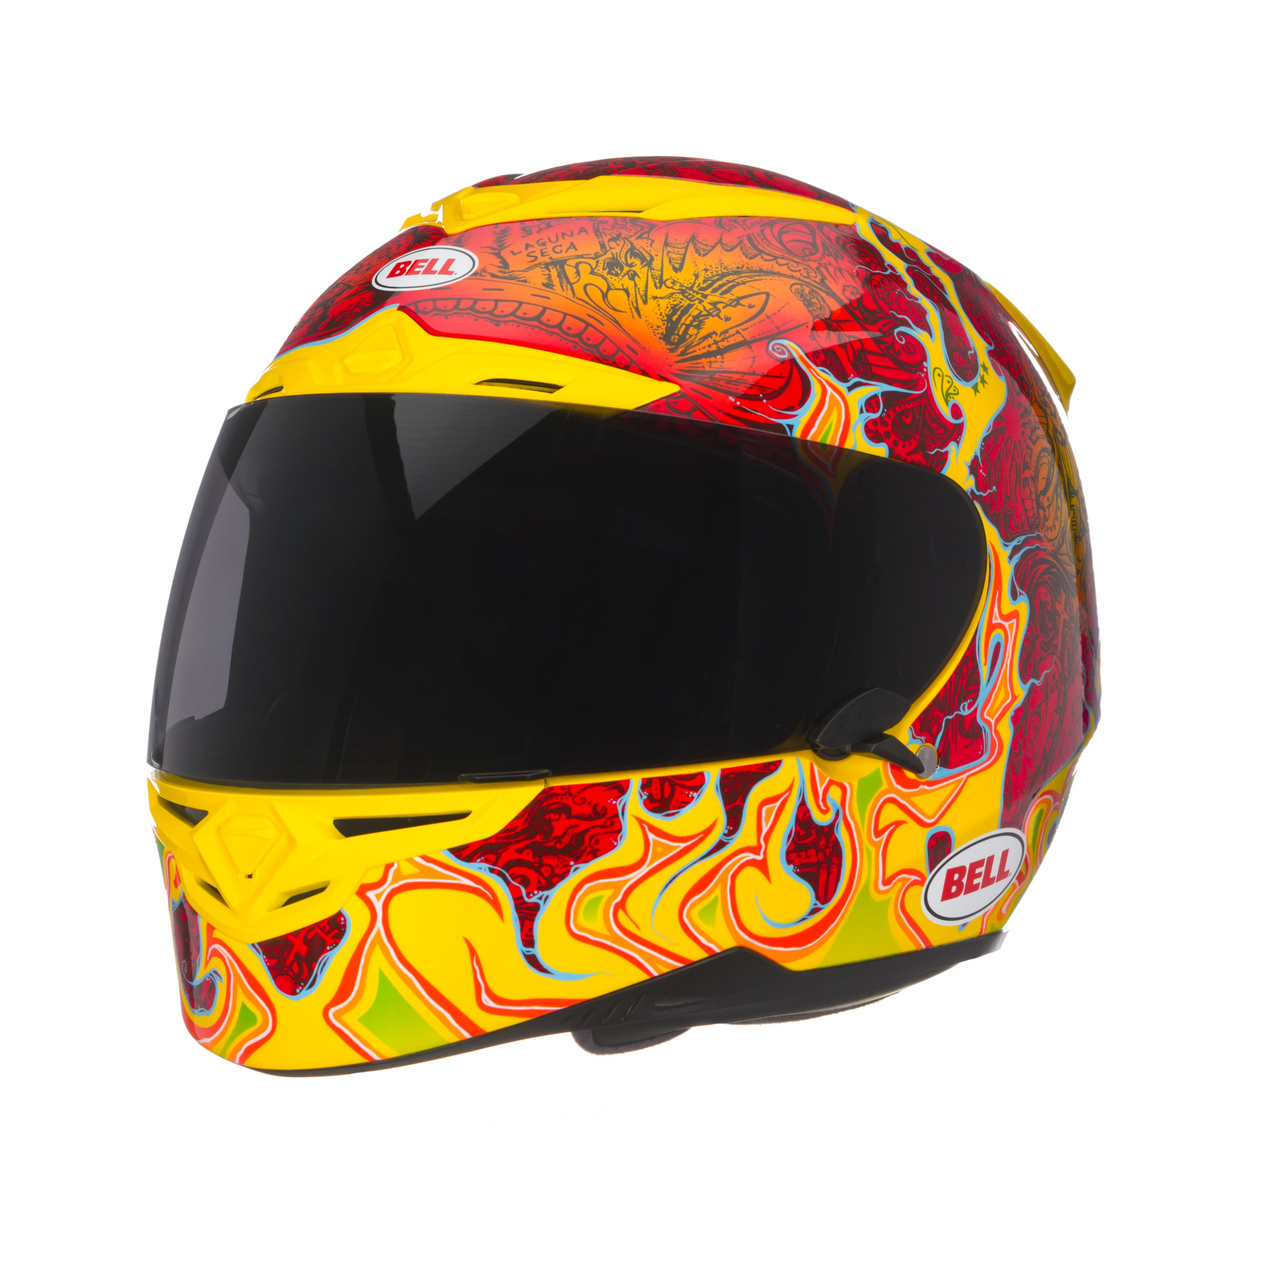 RS-1 Airtrix Meltdown Helmet